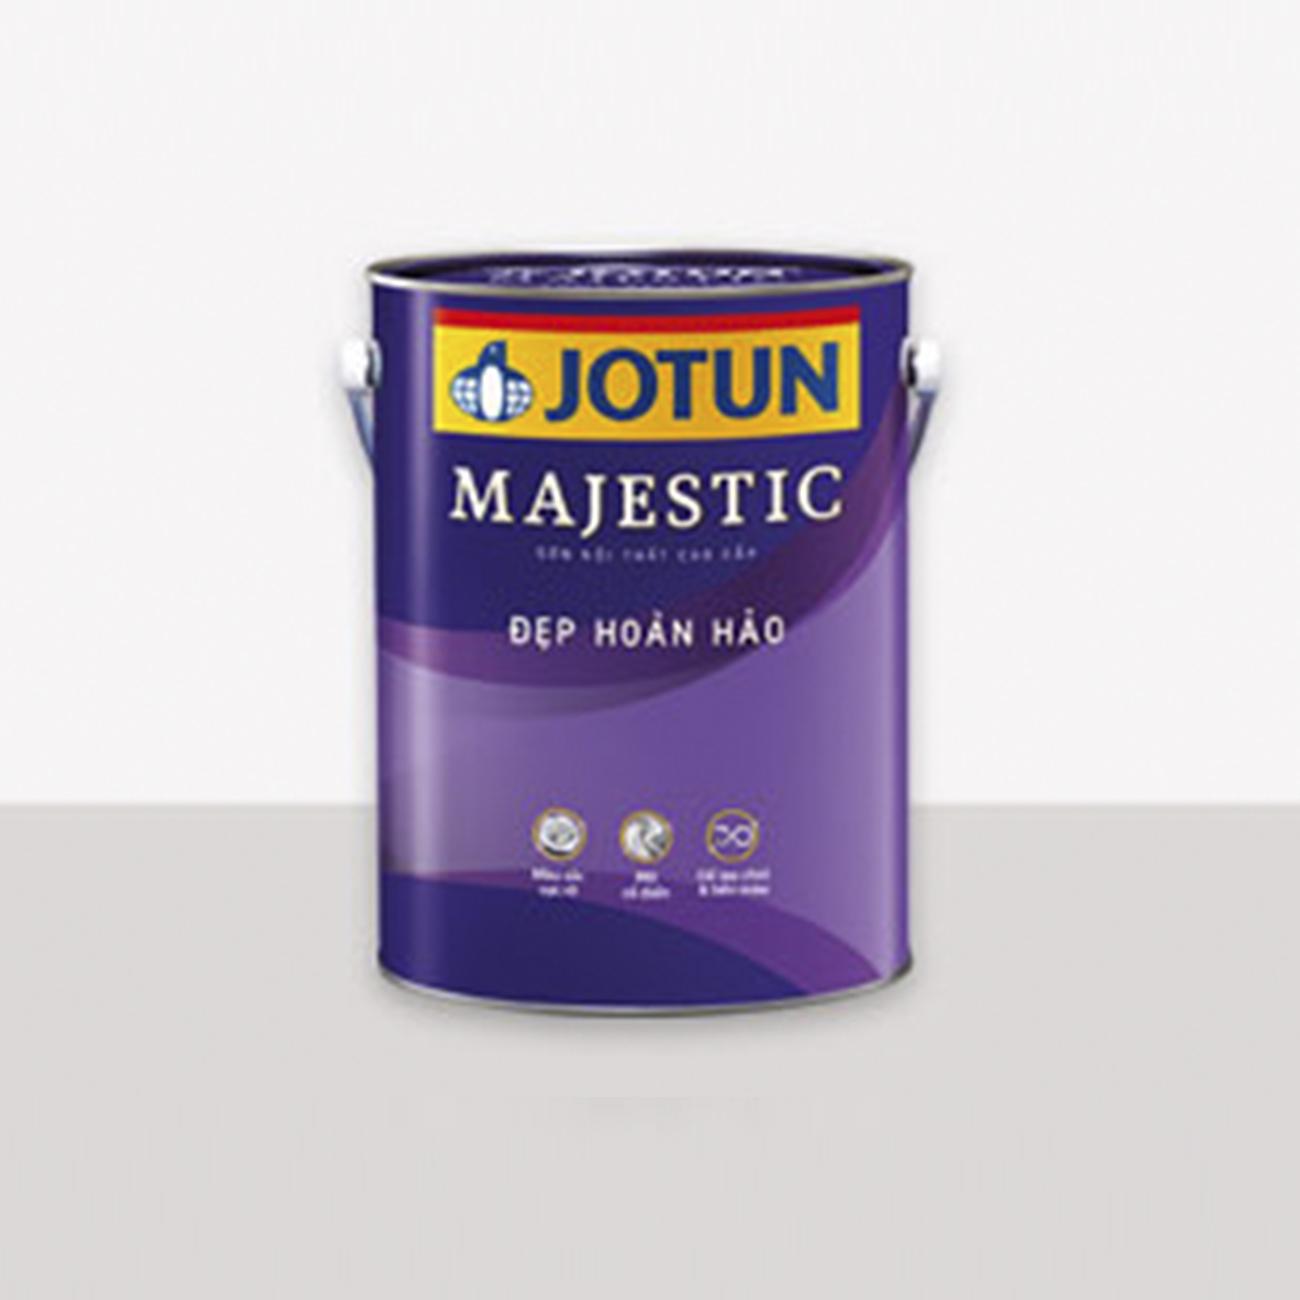 Sơn nội thất Jotun Majestic mờ 5 Lít